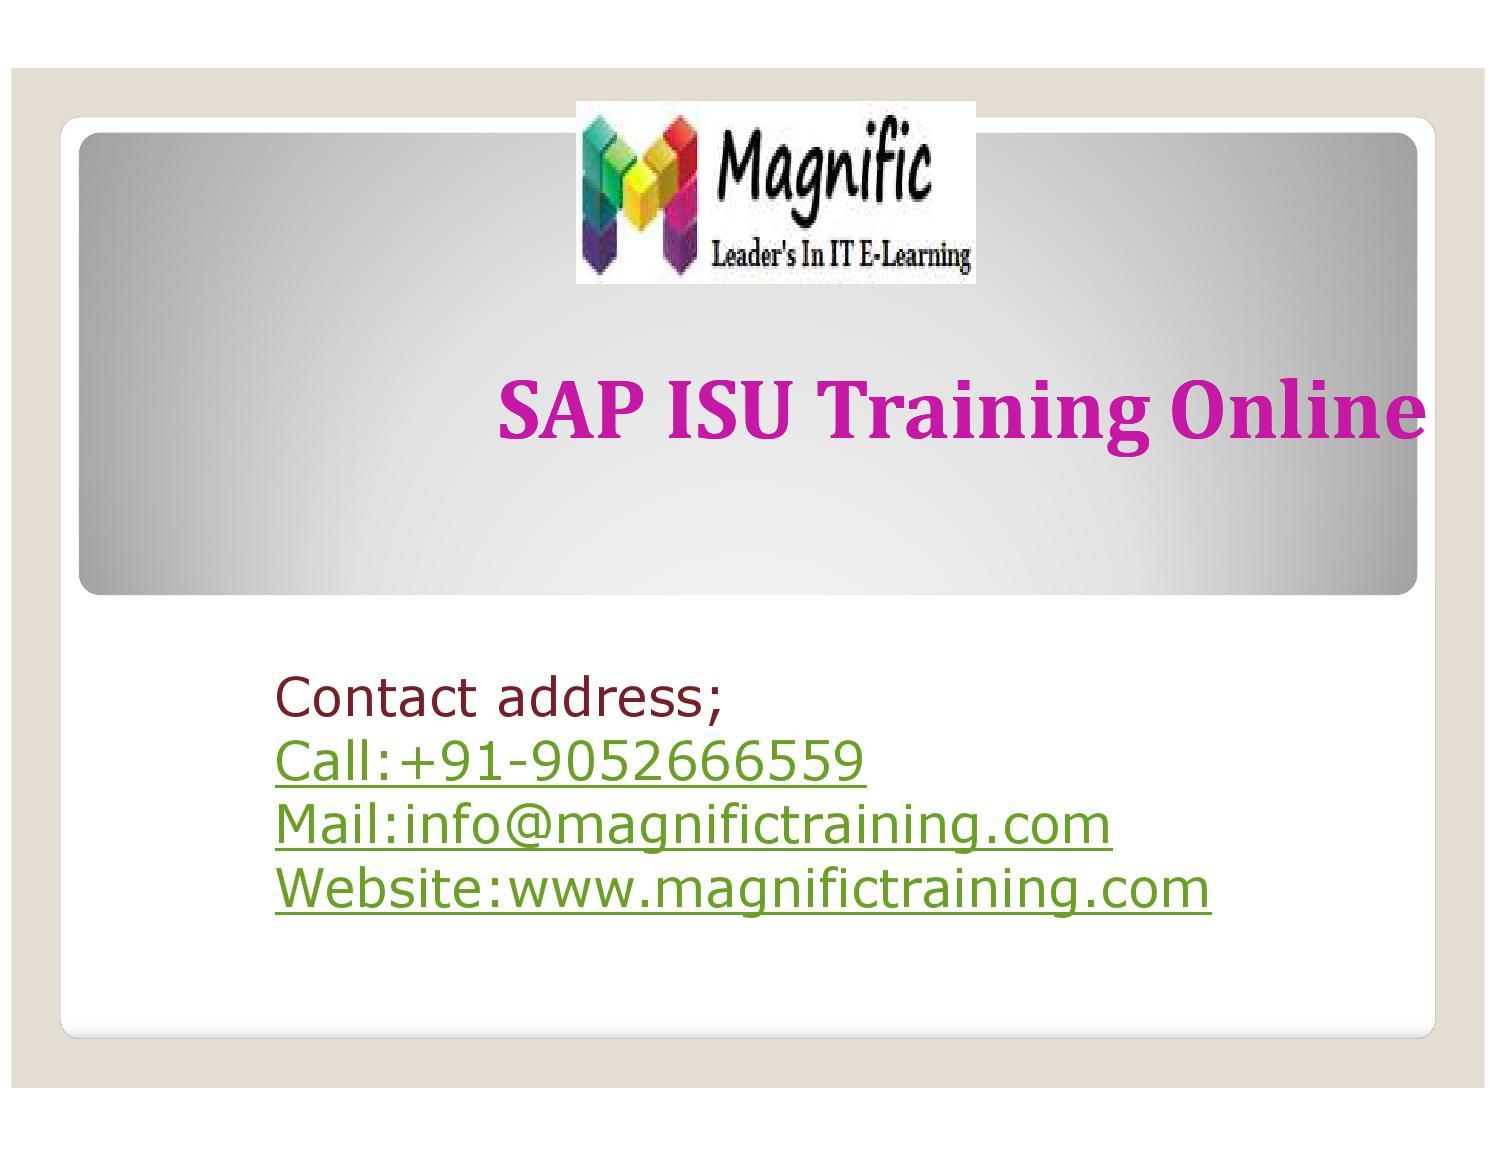 Sap isu training online by magnificks - issuu